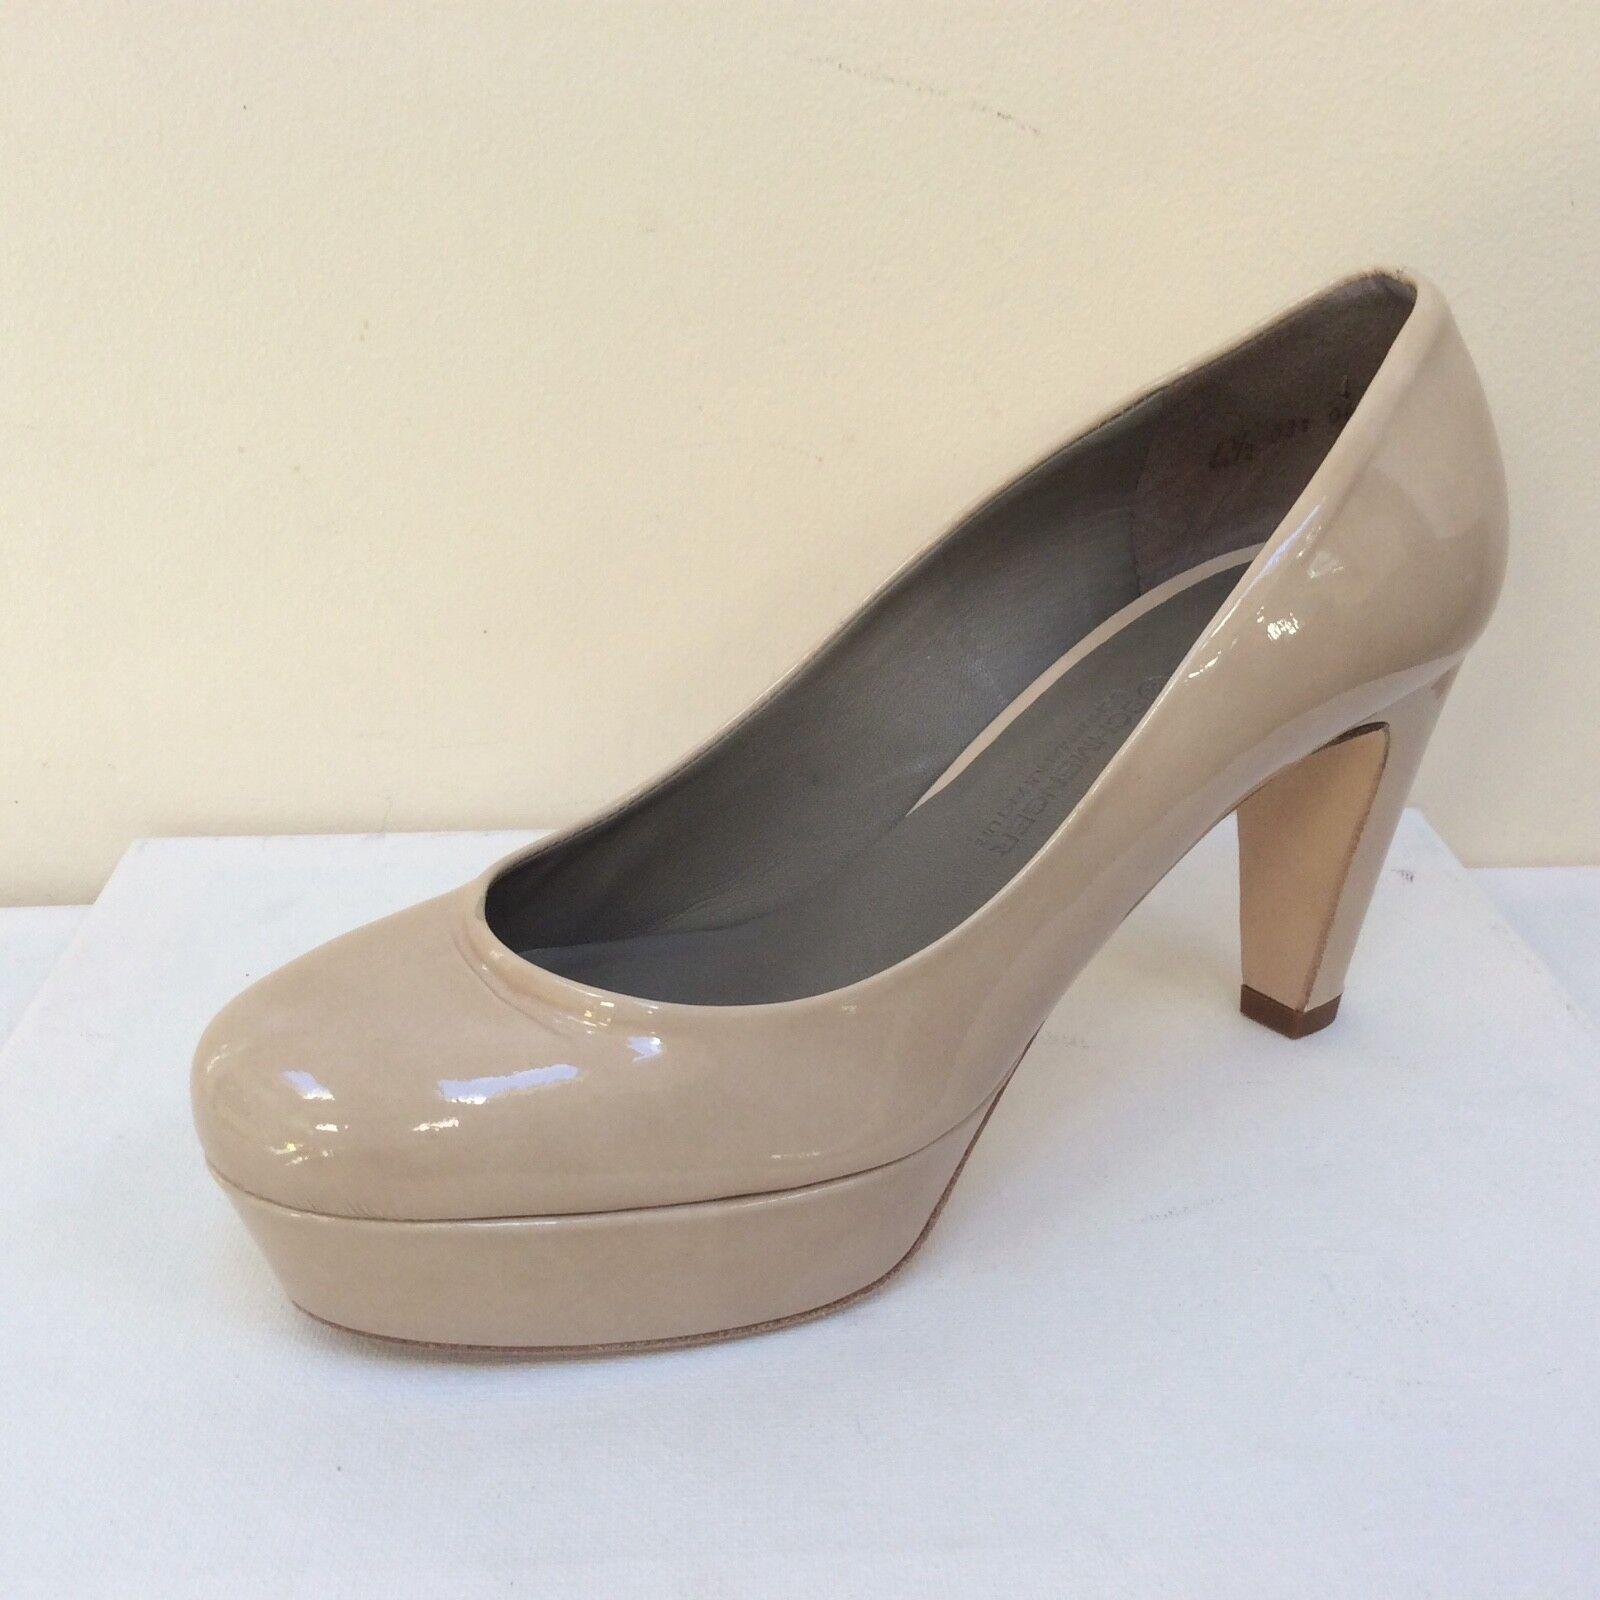 K&s Gil Nude Verni Plateforme Cour Chaussures, UK 4.5 EU 37.5,   BNWB